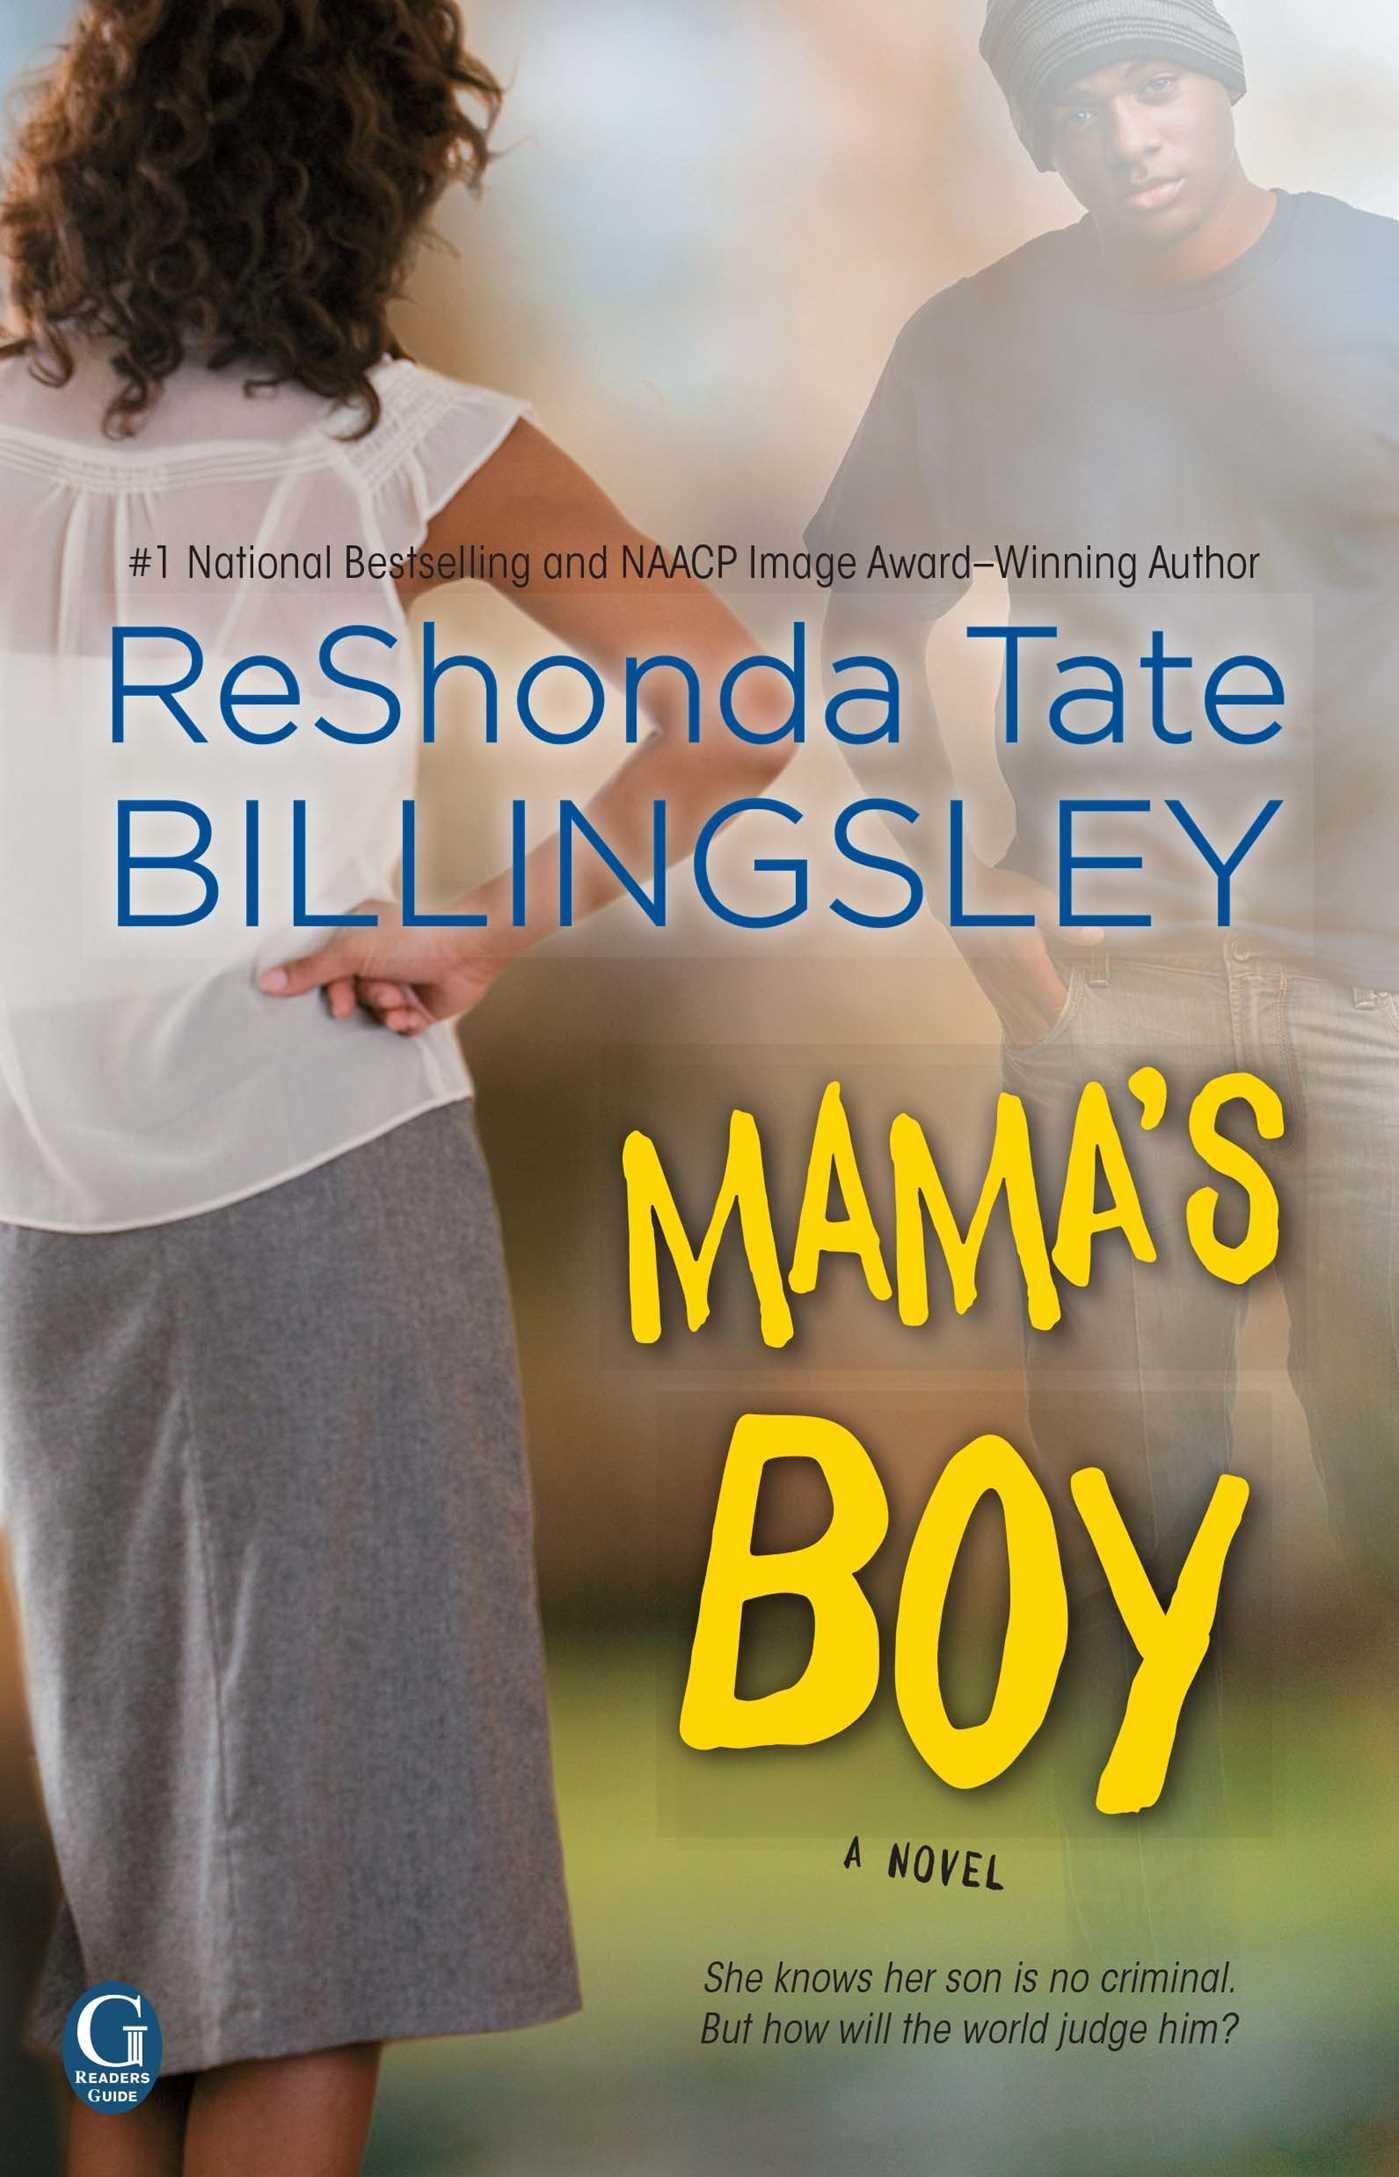 com mama s boy reshonda tate billingsley com mama s boy 9781476714950 reshonda tate billingsley books